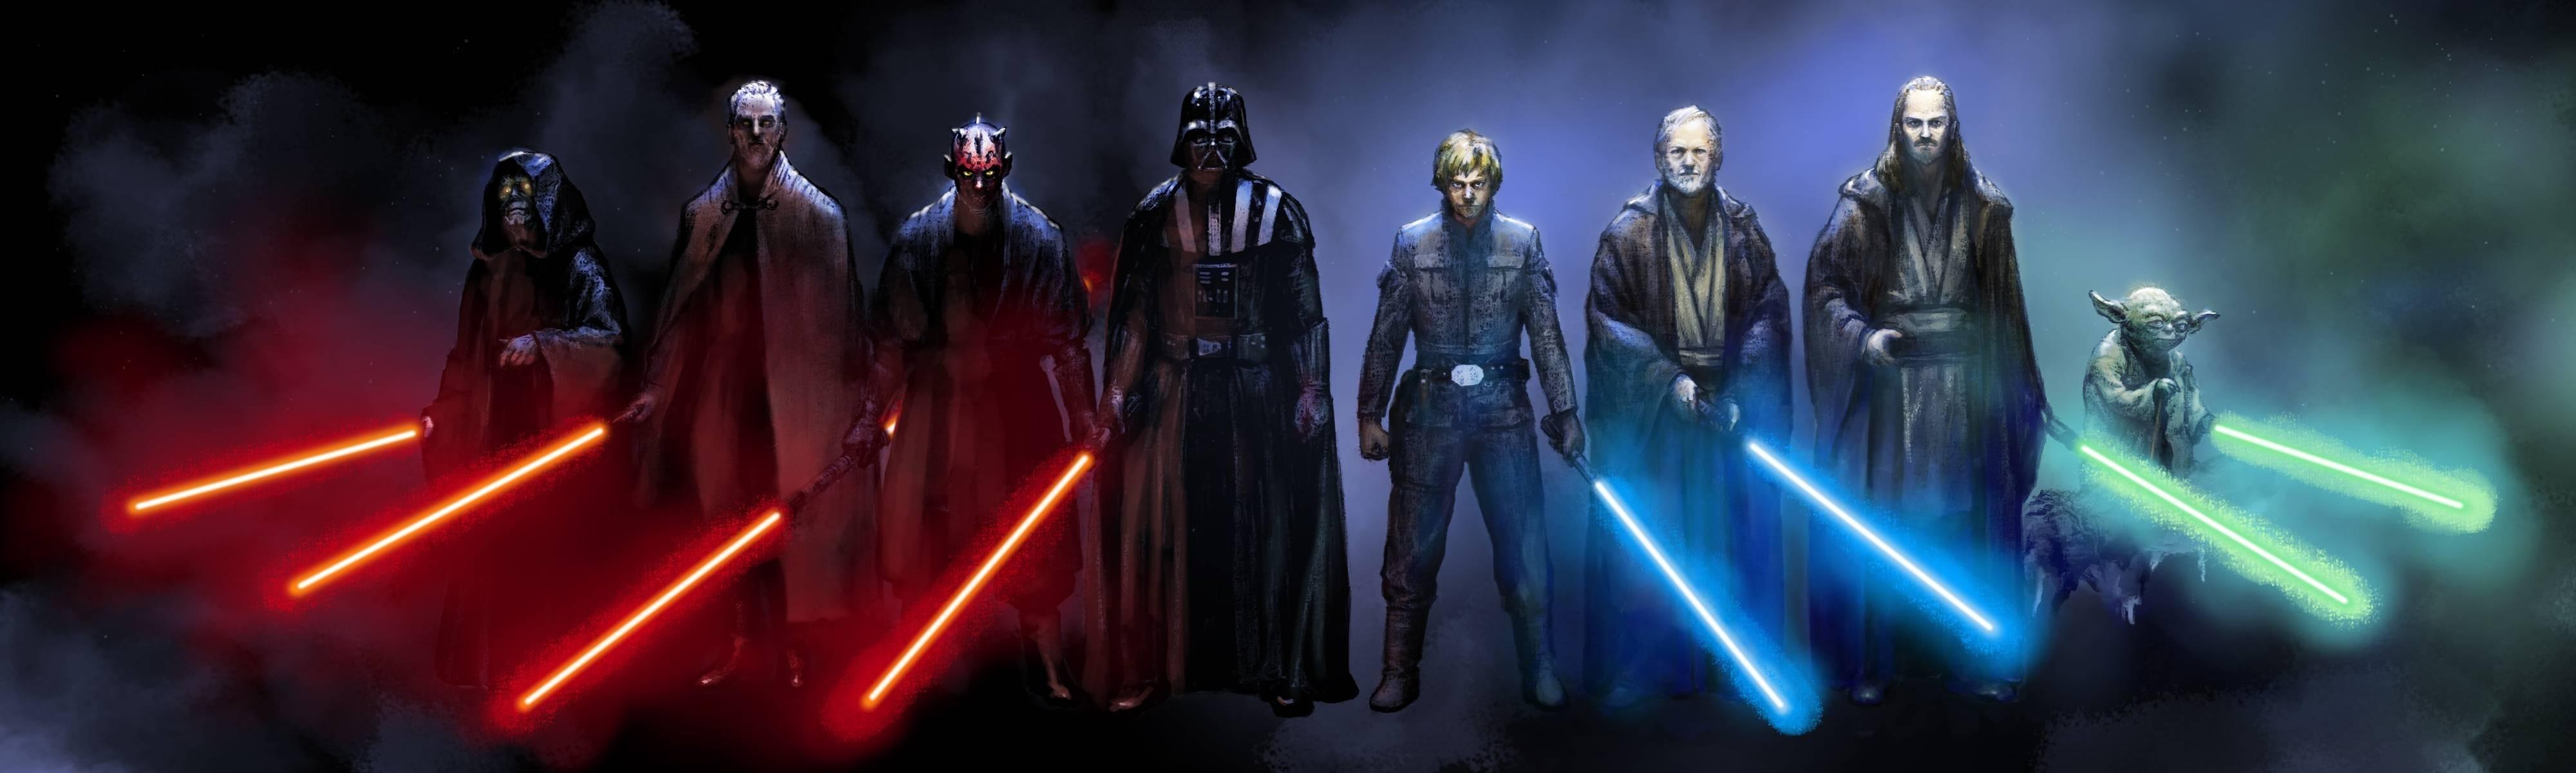 Wallpaper Star Wars Jedi Sith Laser Swords Mask Emperor